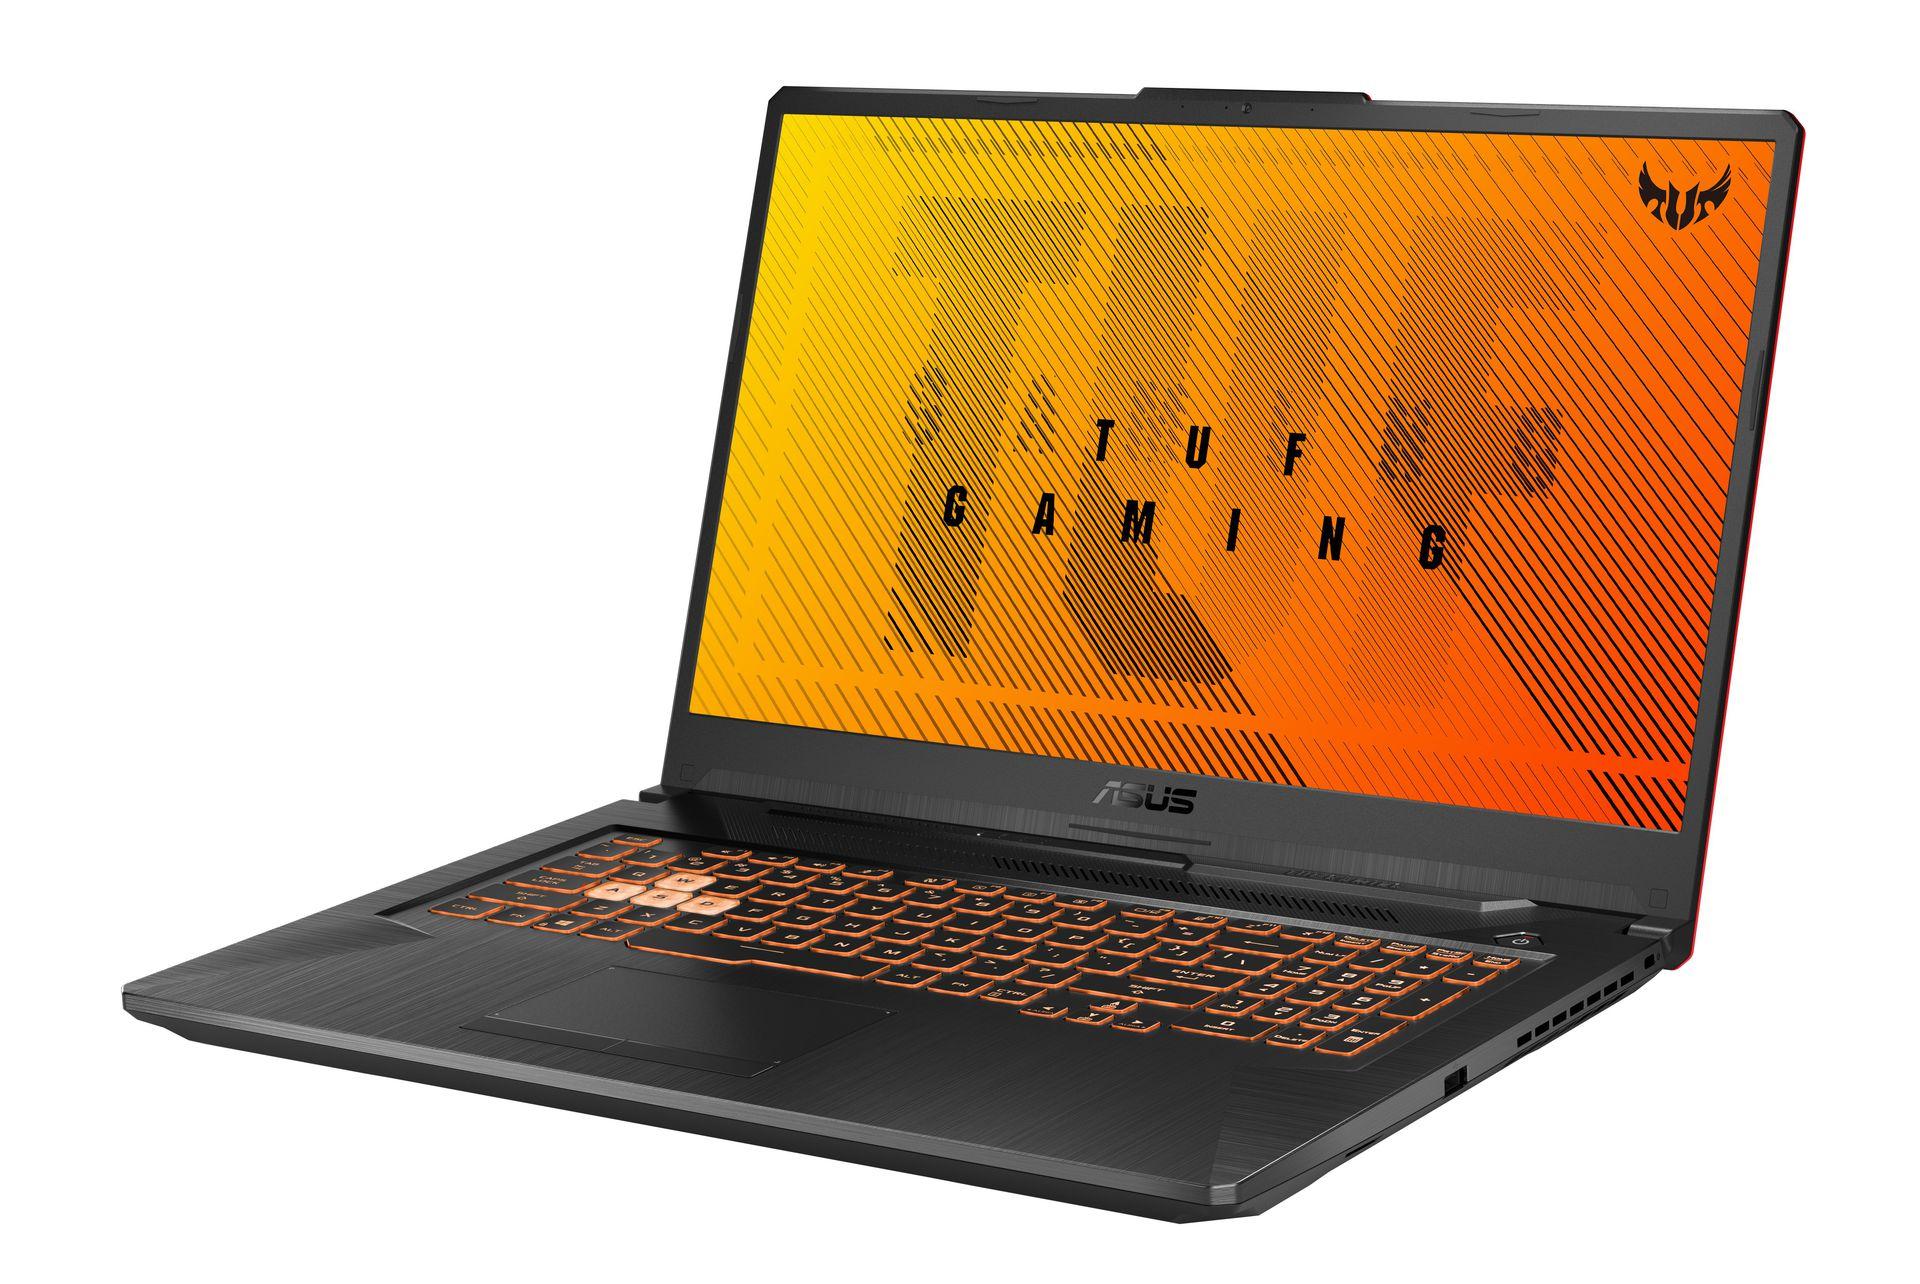 "PC Portable 15.6"" Asus TUF Gaming FA506IV-HN305 - Full HD 144Hz, Ryzen 7-4800H, 8Go RAM, 512Go SSD, RTX 2060, QWERTZ (computeruniverse.net)"